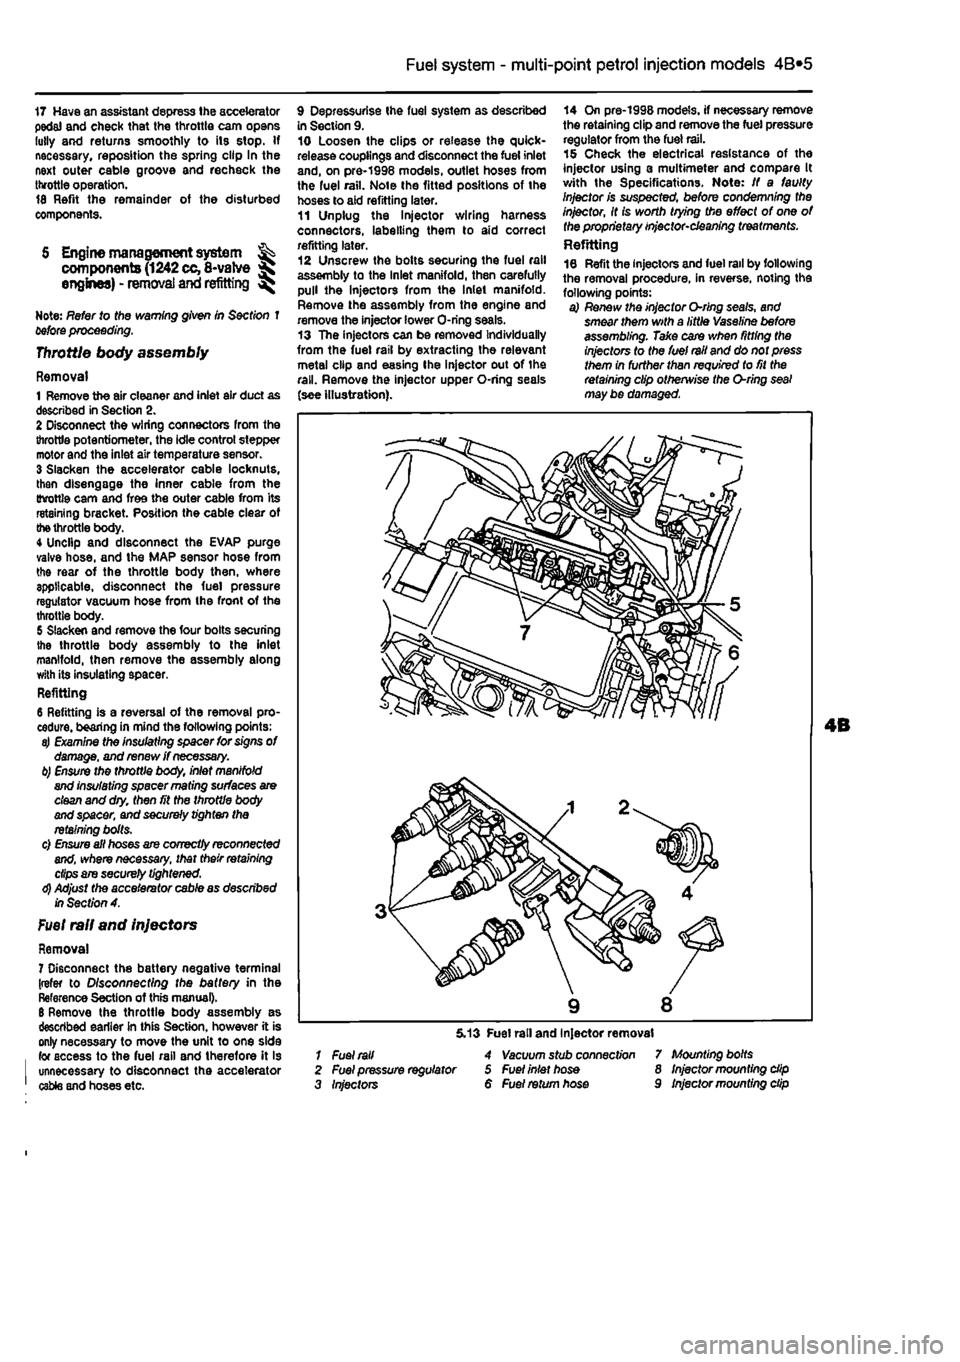 Warning Fiat Punto 1998 176 1g Workshop Manual Fuel Pump Diagram Page 131 4a2 System